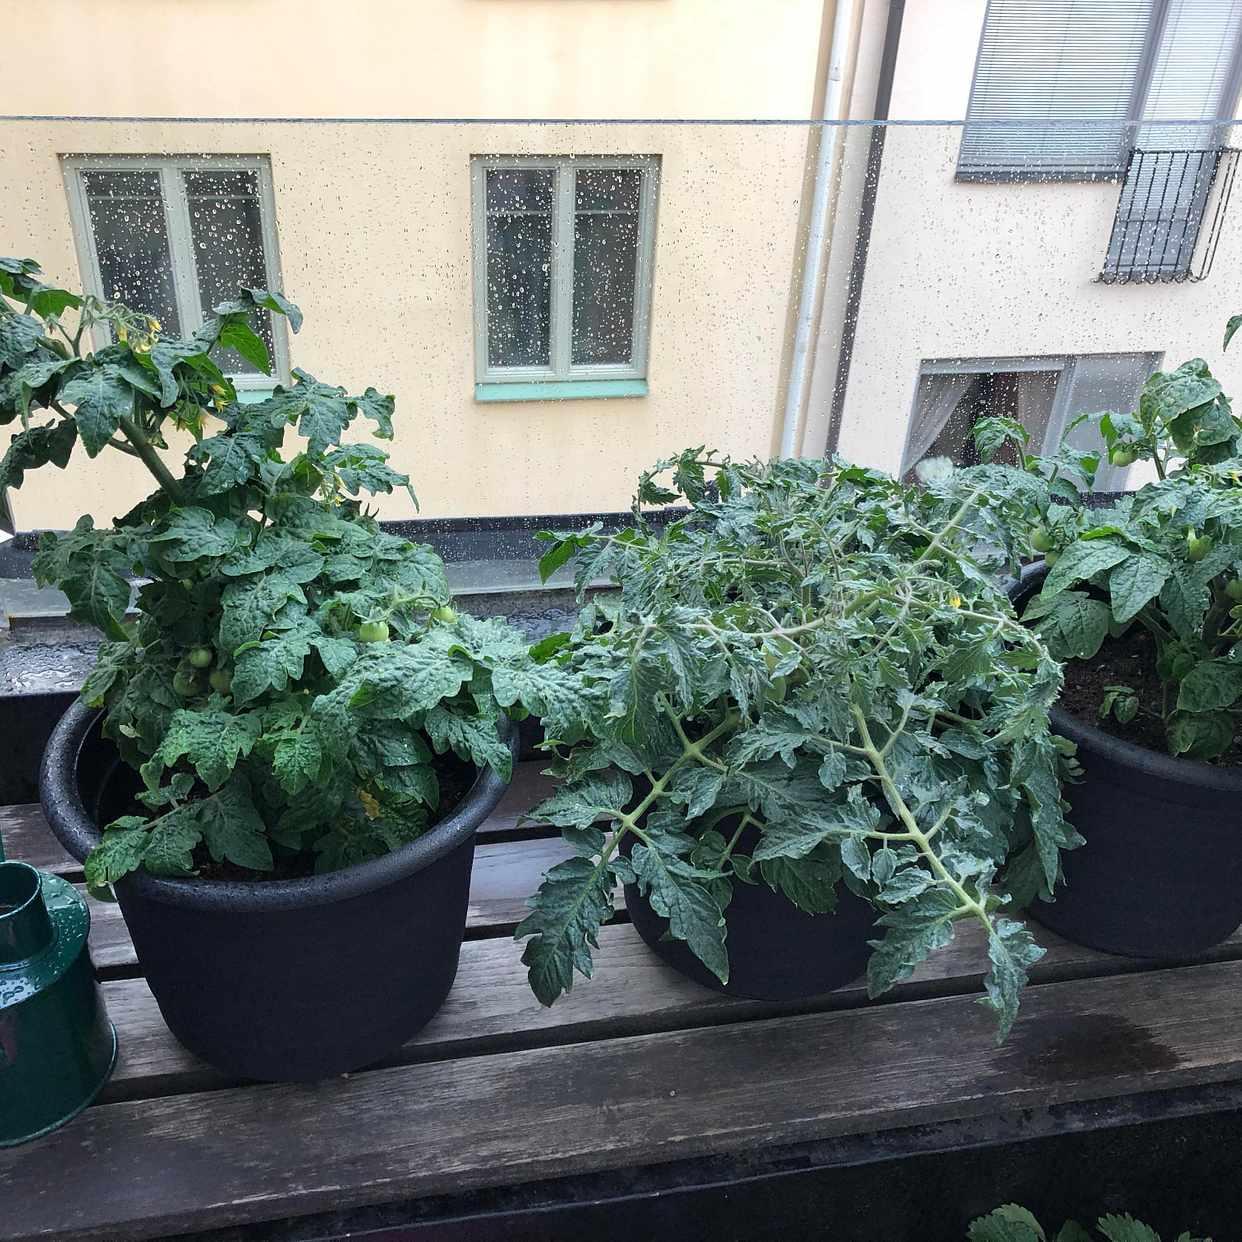 image of 3 tomato plants and a bag -